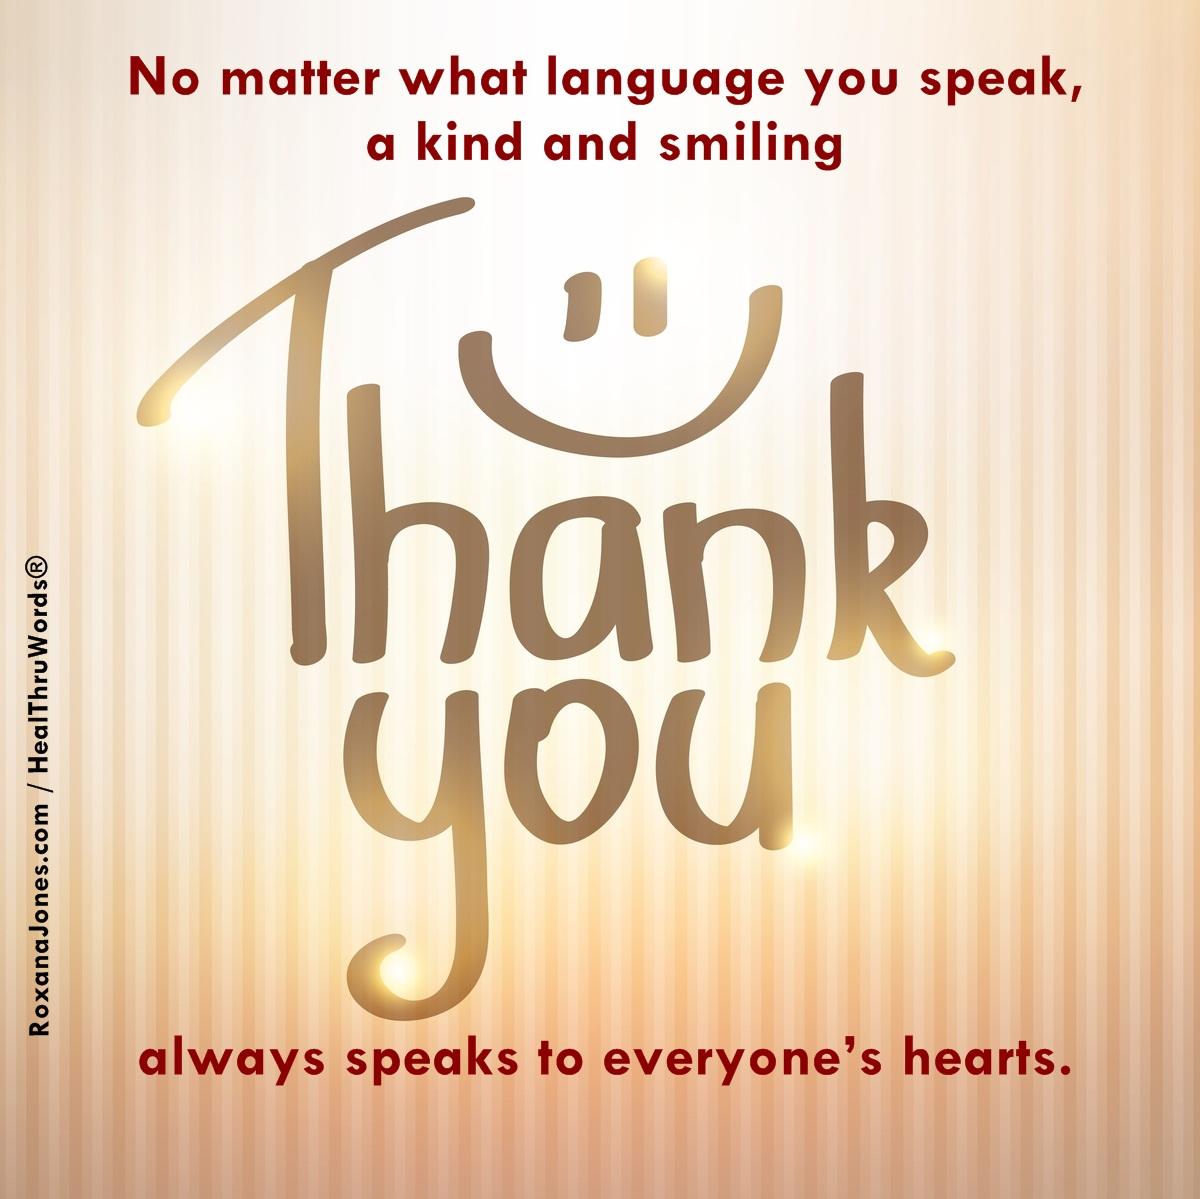 Copyright Free Inspirational Quotes Quotesgram: Inspirational Quotes About Appreciation. QuotesGram